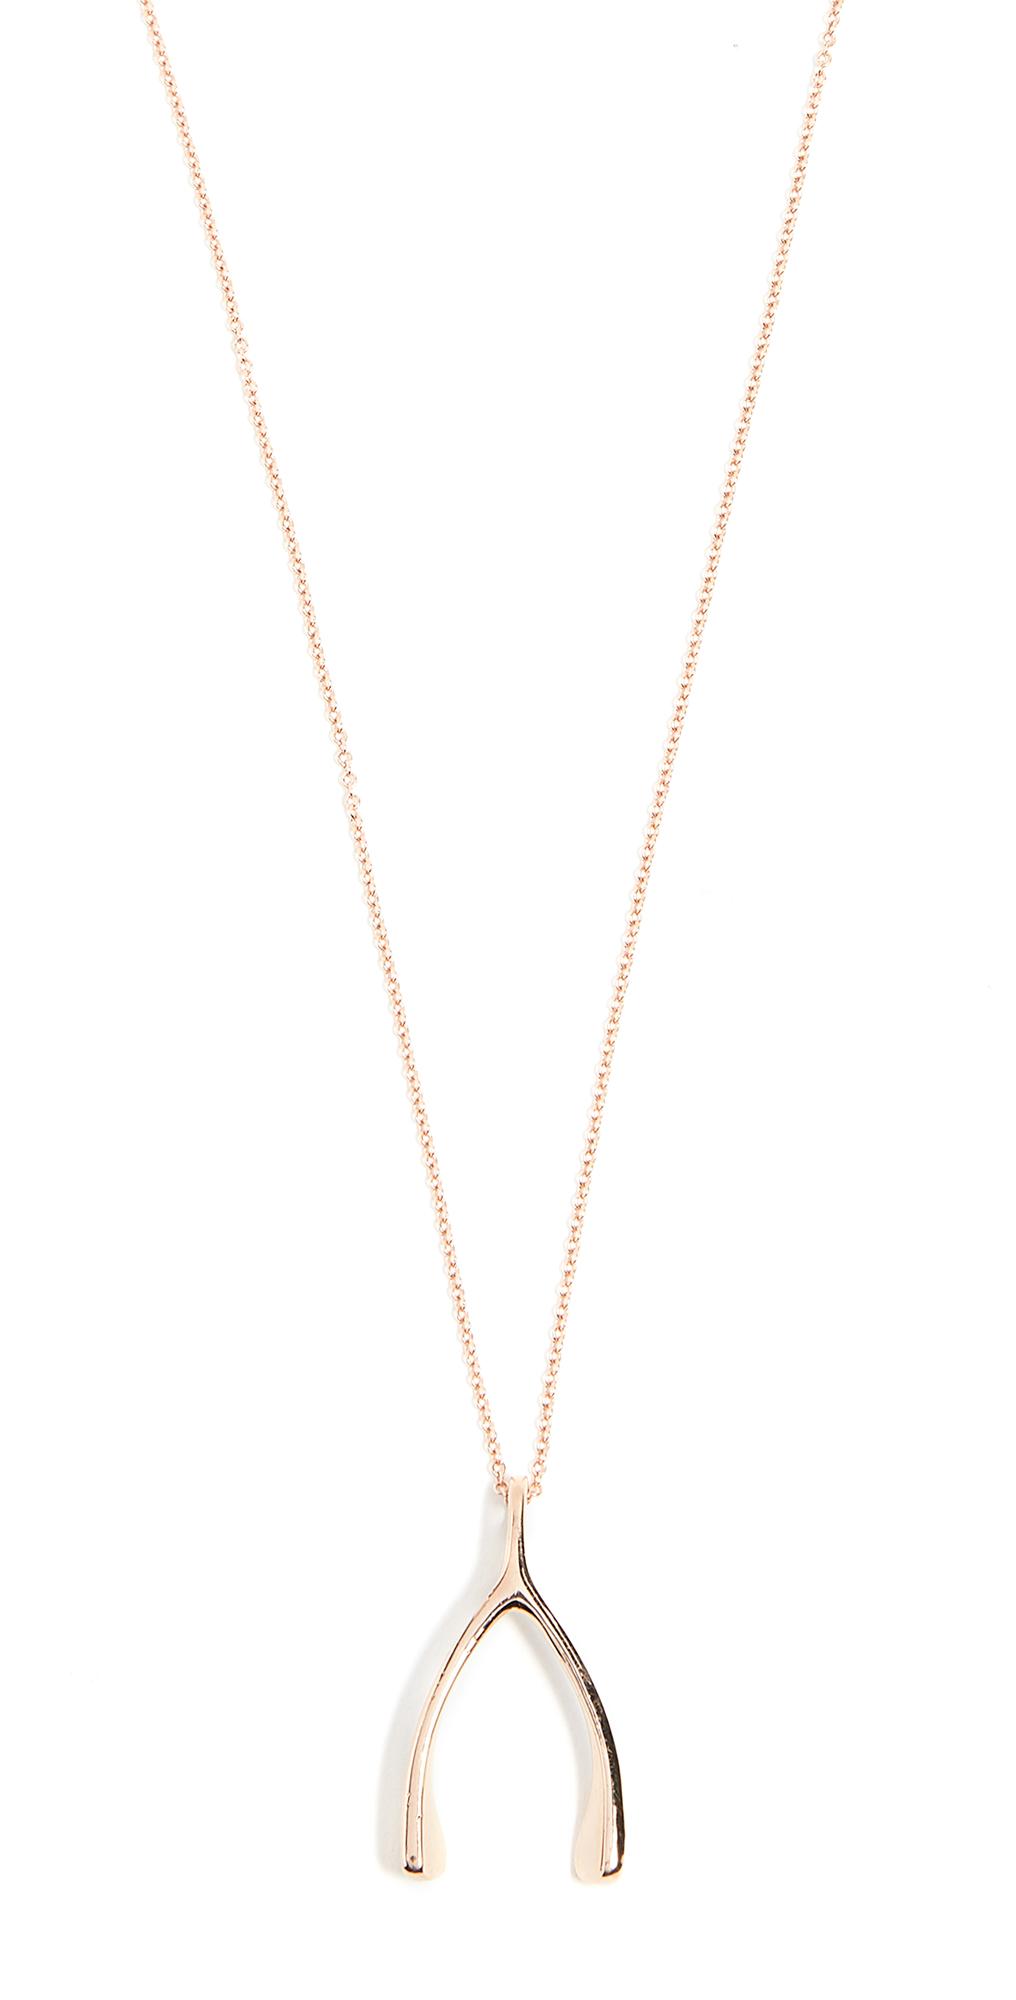 18k Rose Gold Wishbone Necklace